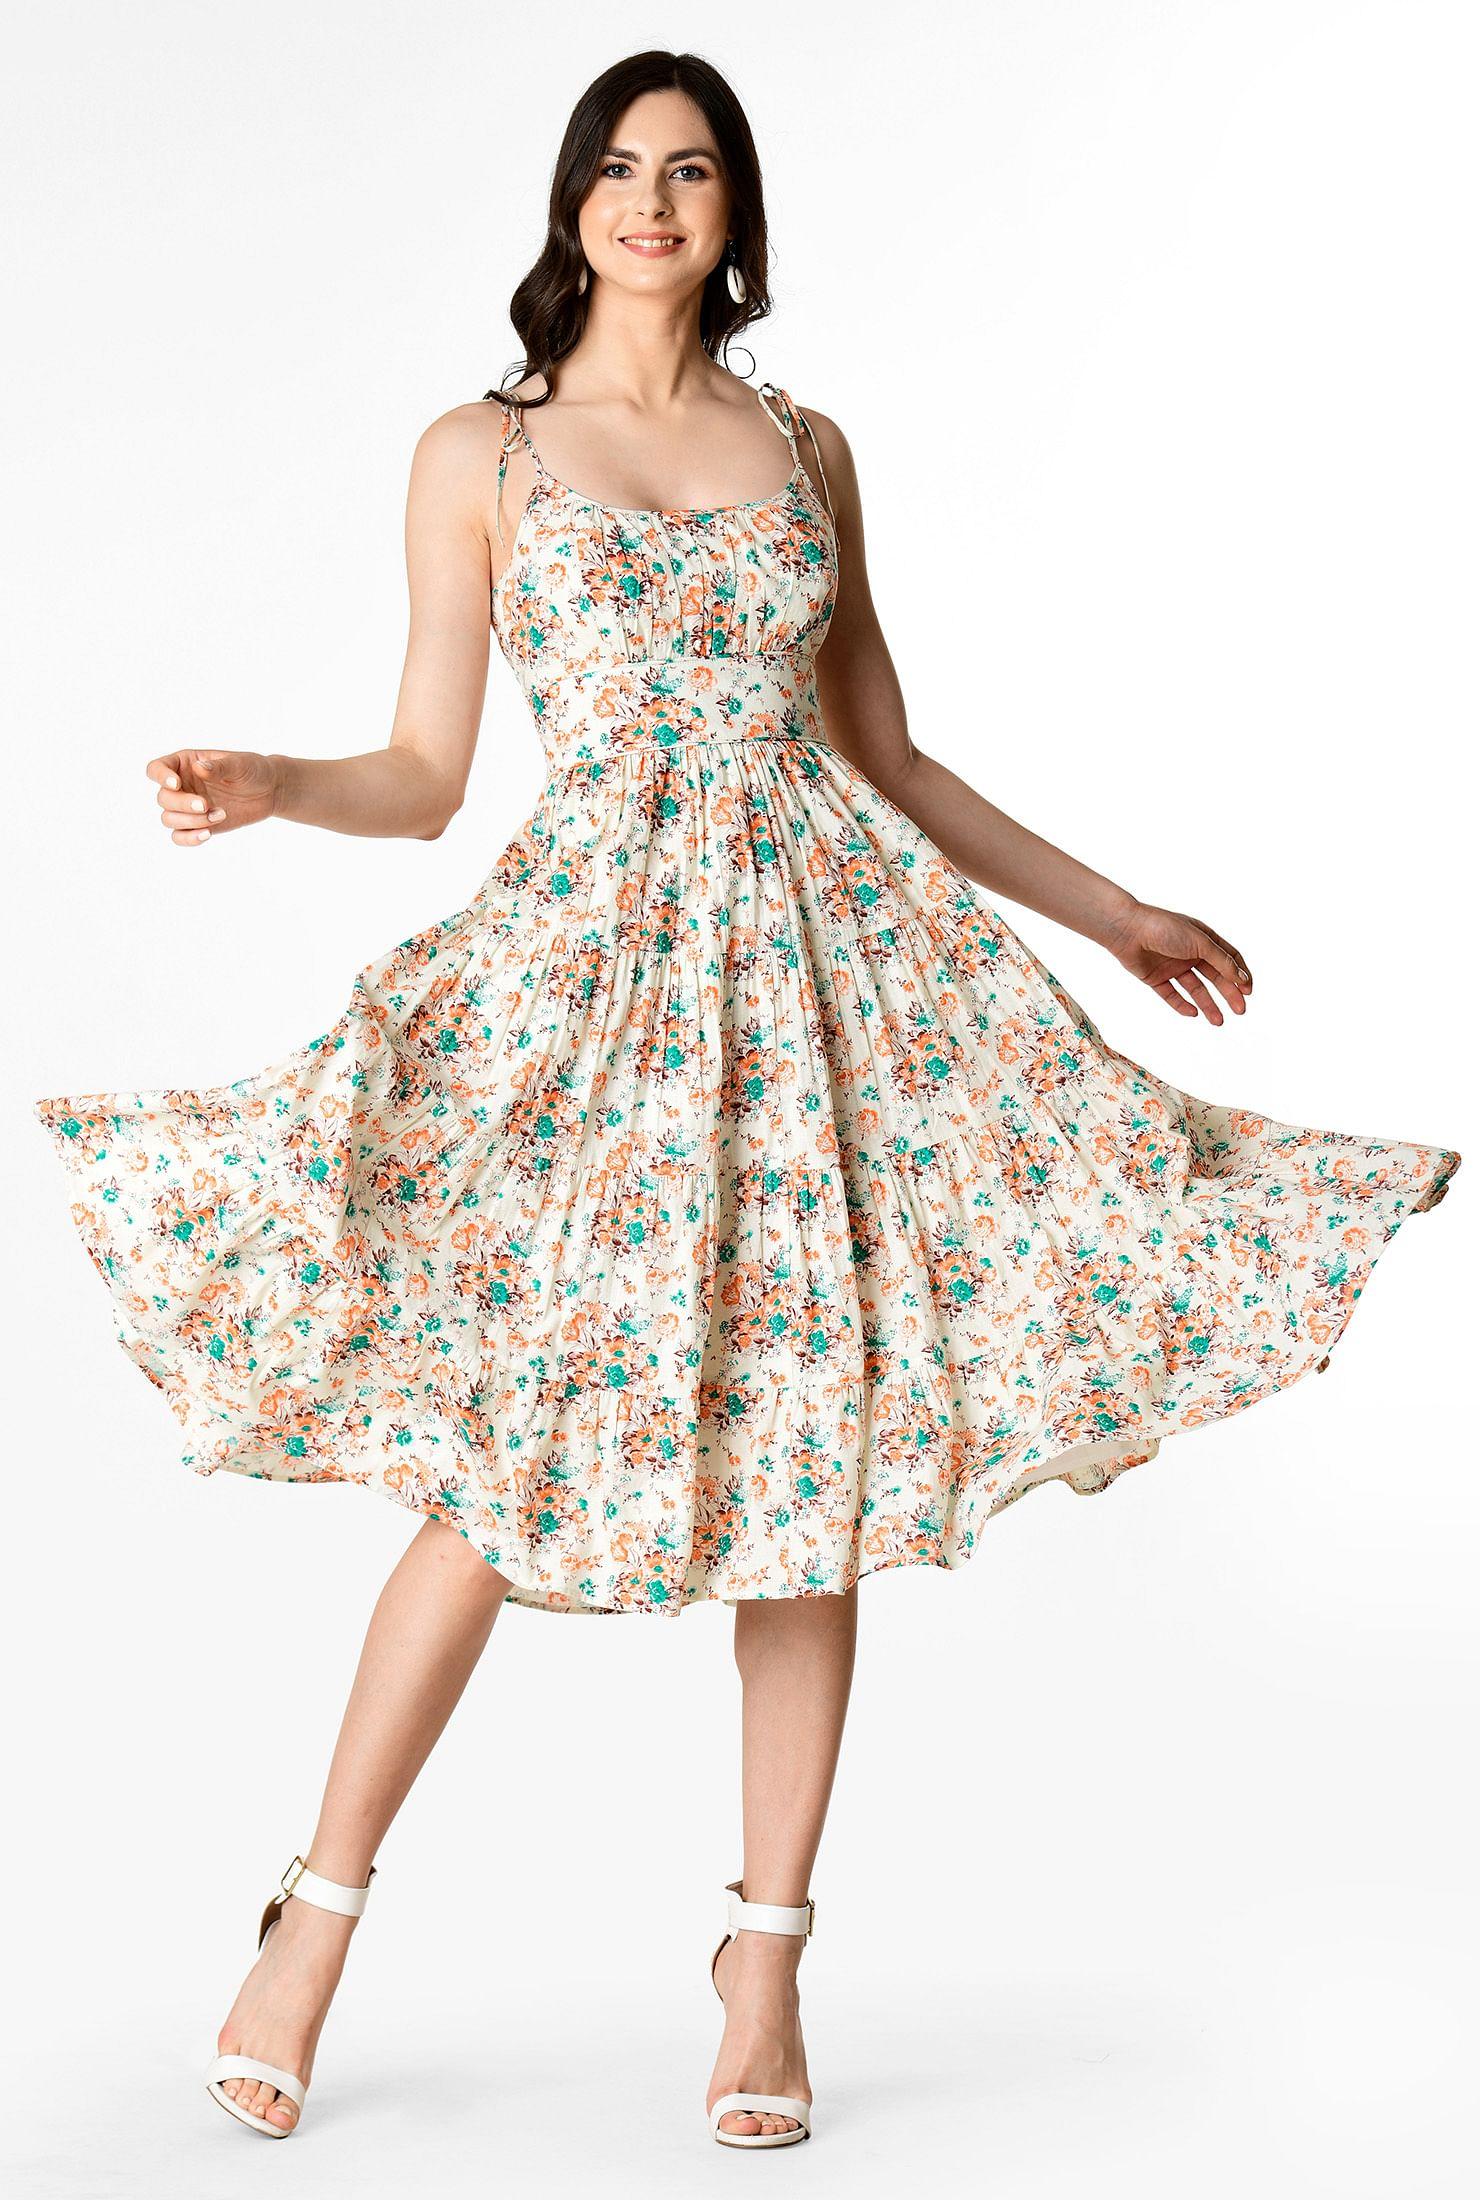 f386c67a163d Women's Fashion Clothing 0-36W and Custom